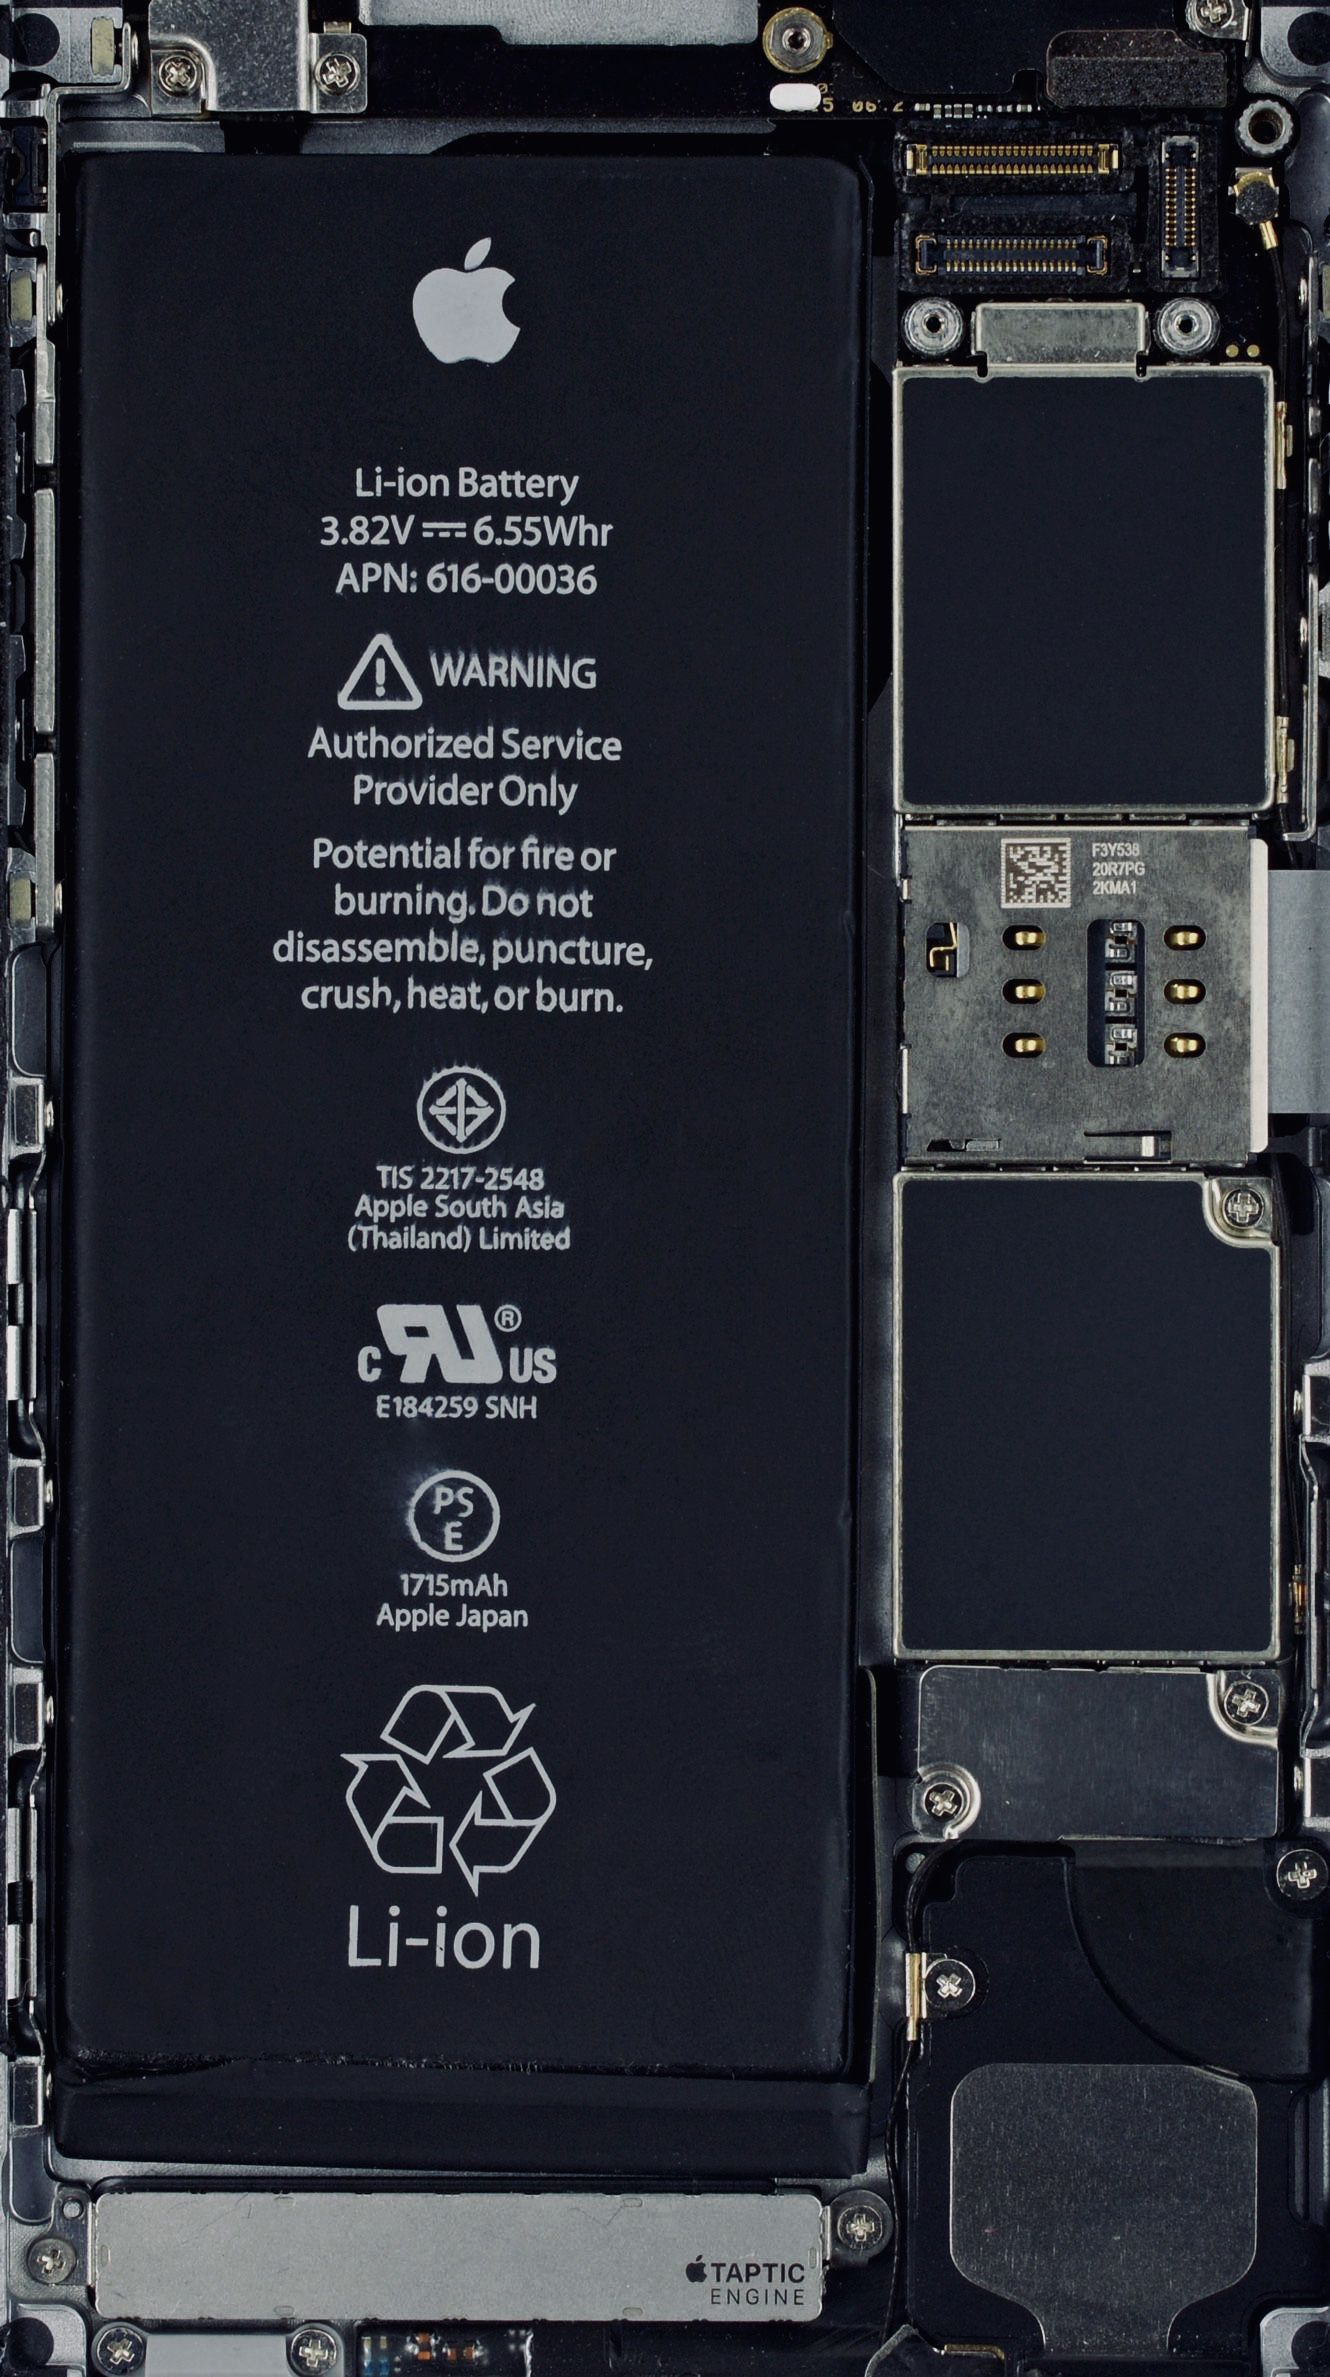 Iphone 6s Inside Wallpaper Iphone 6s Wallpaper Iphone 7 Plus Wallpaper Iphone Wallpaper Inside